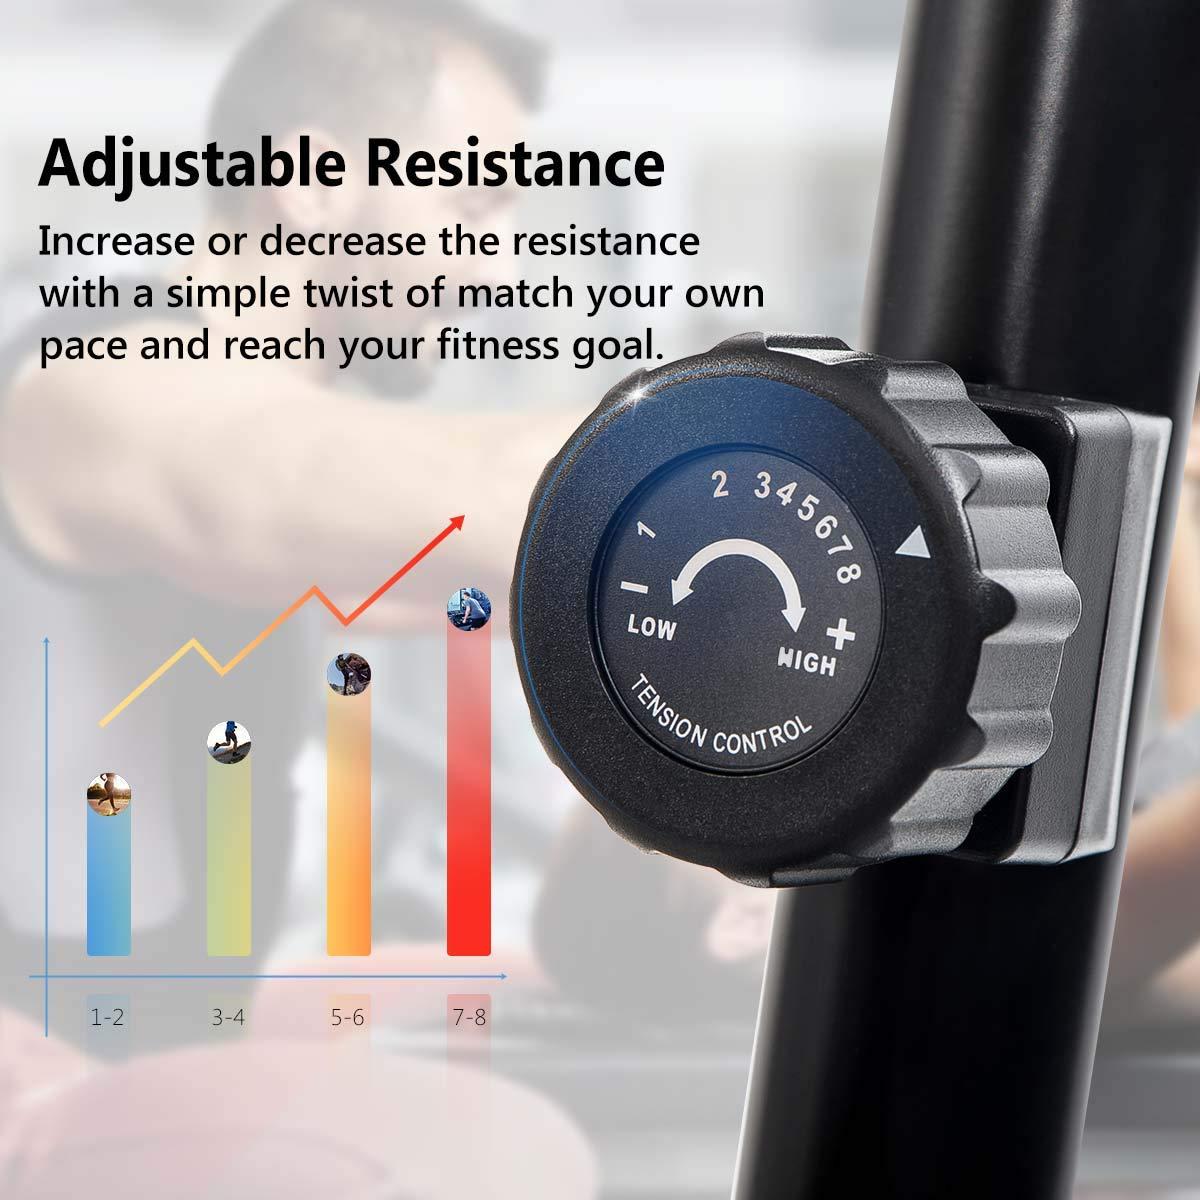 Merax Magnetic Recumbent Exercise Bike | 8-Level Resistance | Quick Adjust Seat (Black/Yellow) by Merax (Image #3)